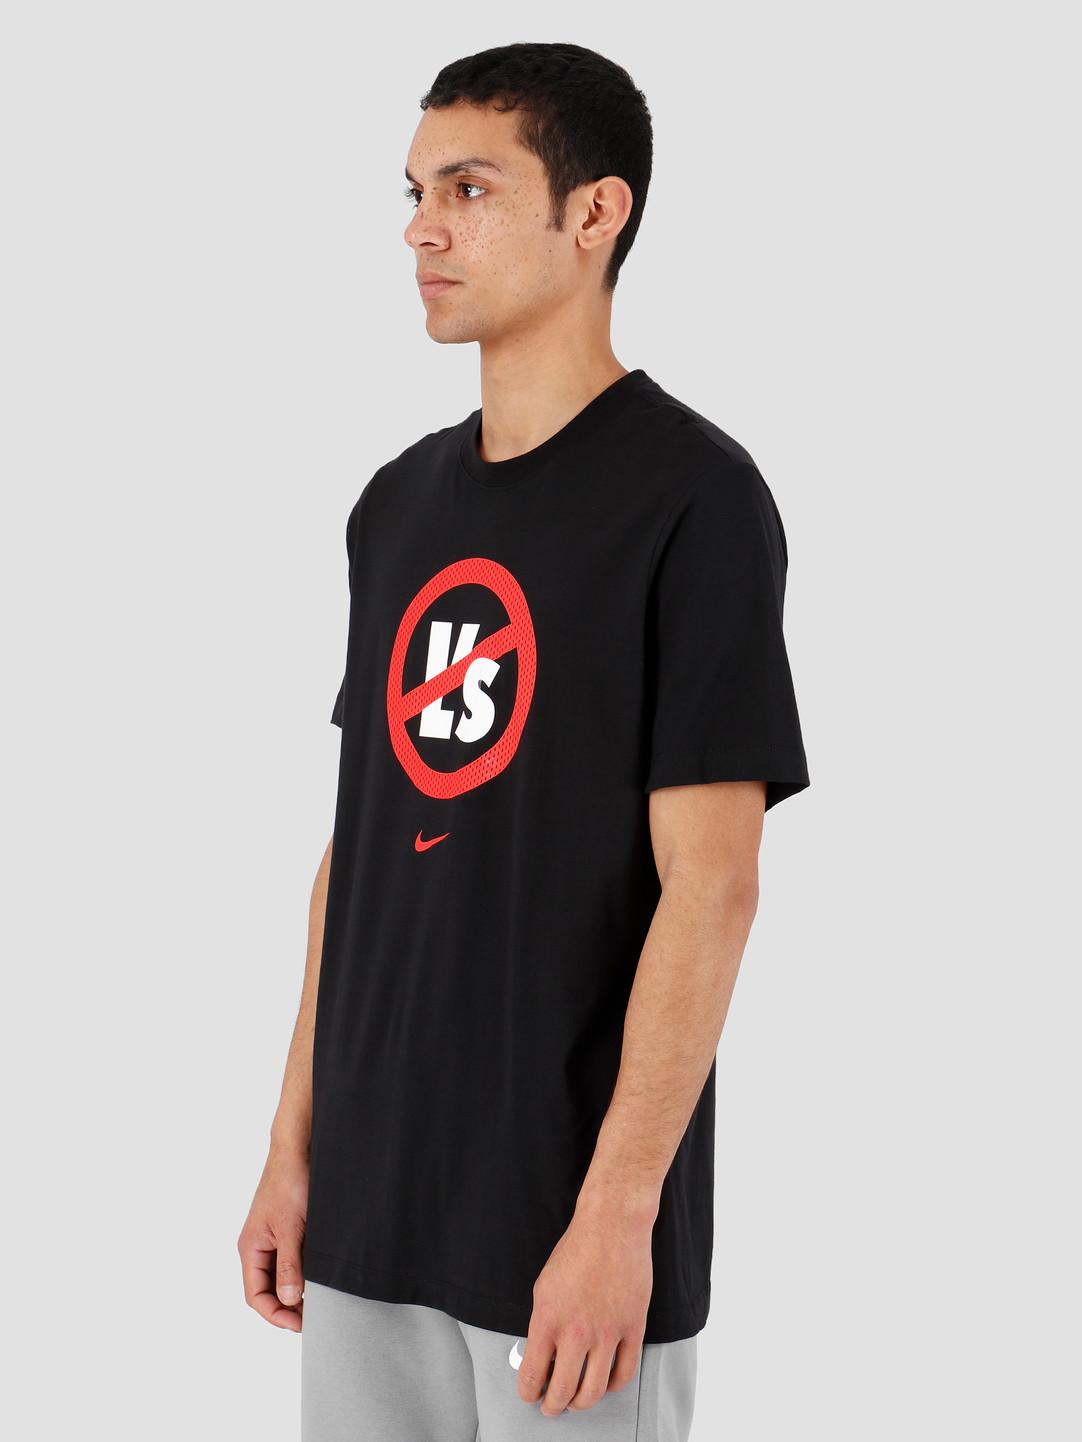 Nike Nike NSW T-shirt Snkr Cltr 9 Black CK2672-010